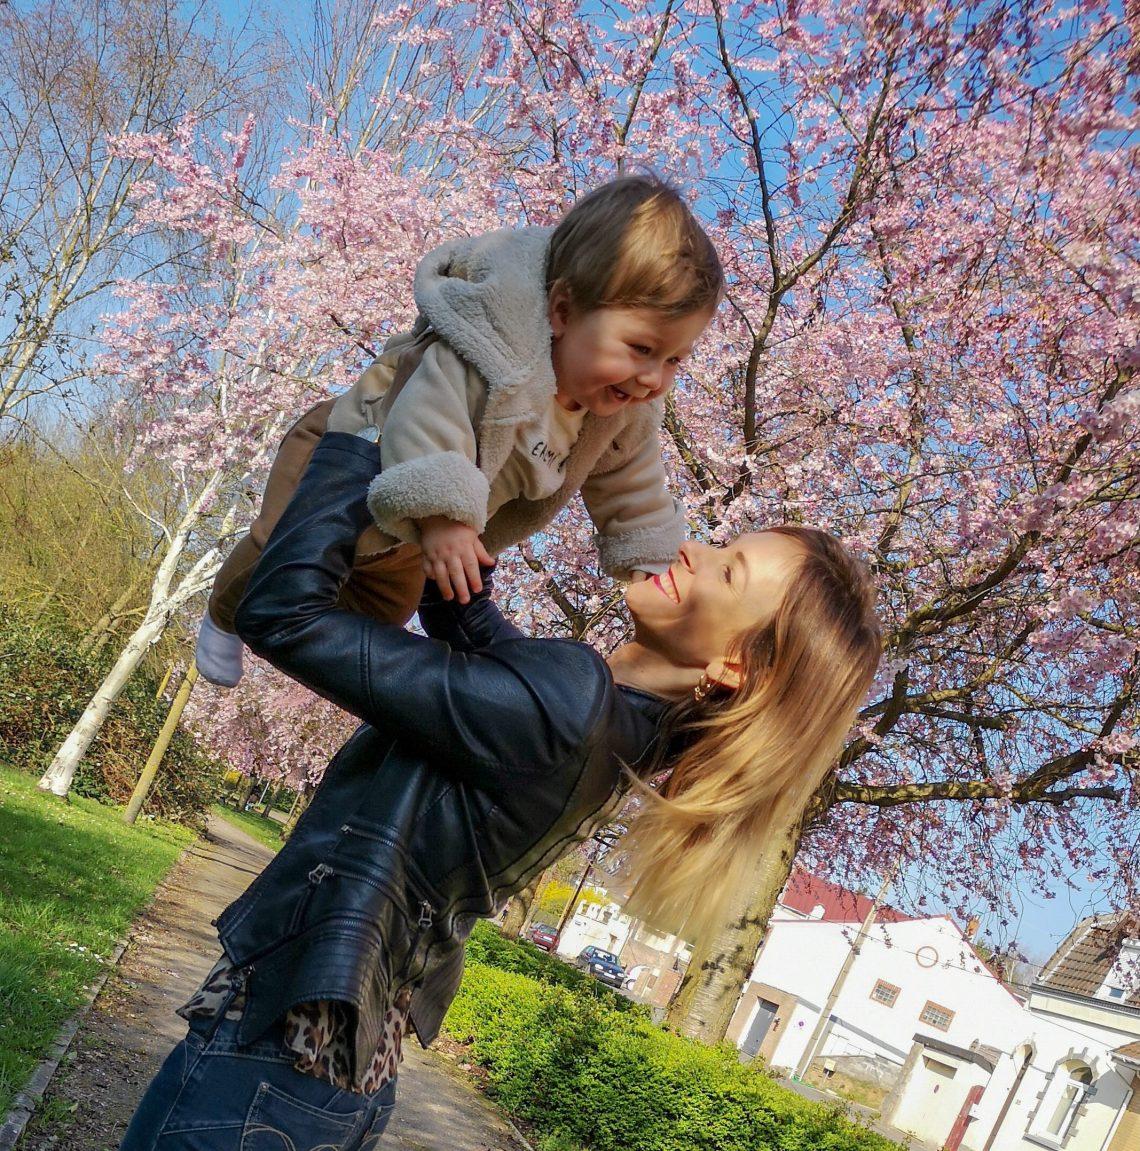 cindychtis maman shooting bébé Gabin cute baby